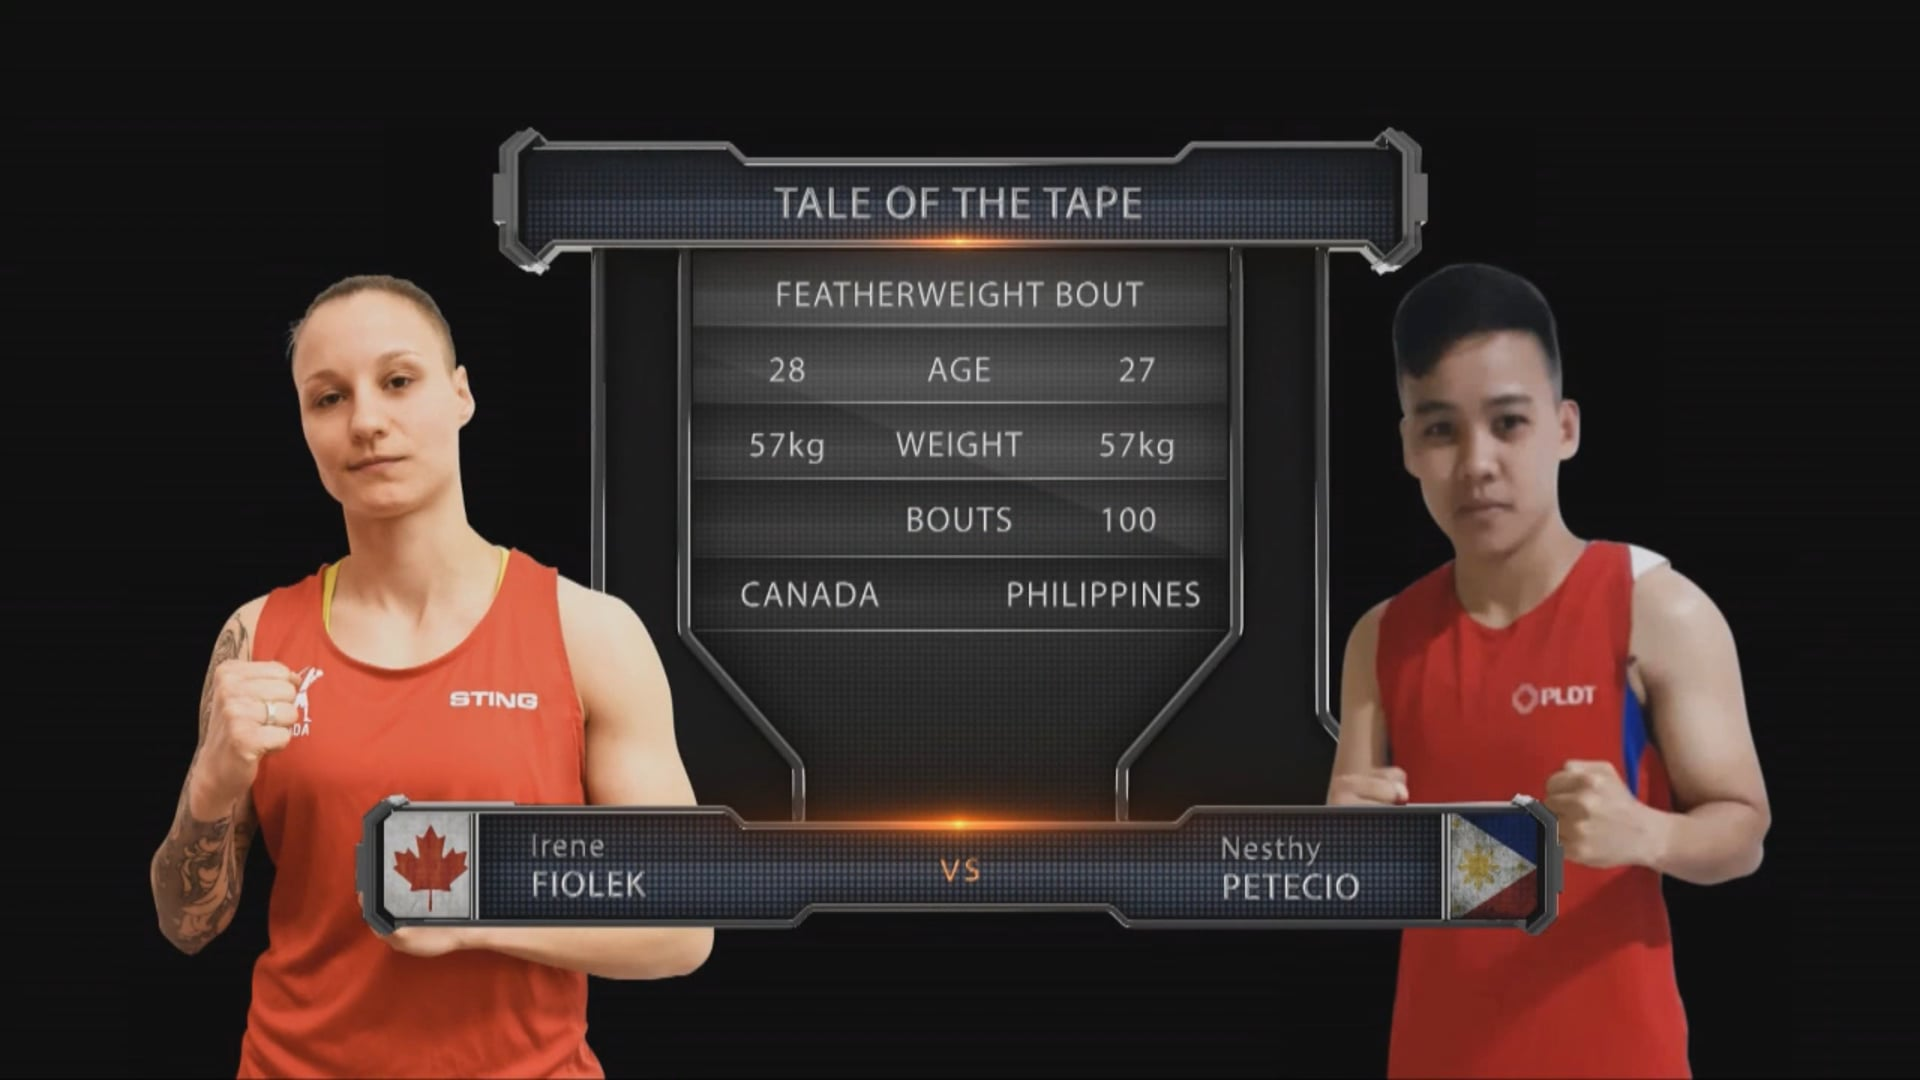 Irene Fiolek (CAN) vs Nesthy Petecio (PHL)